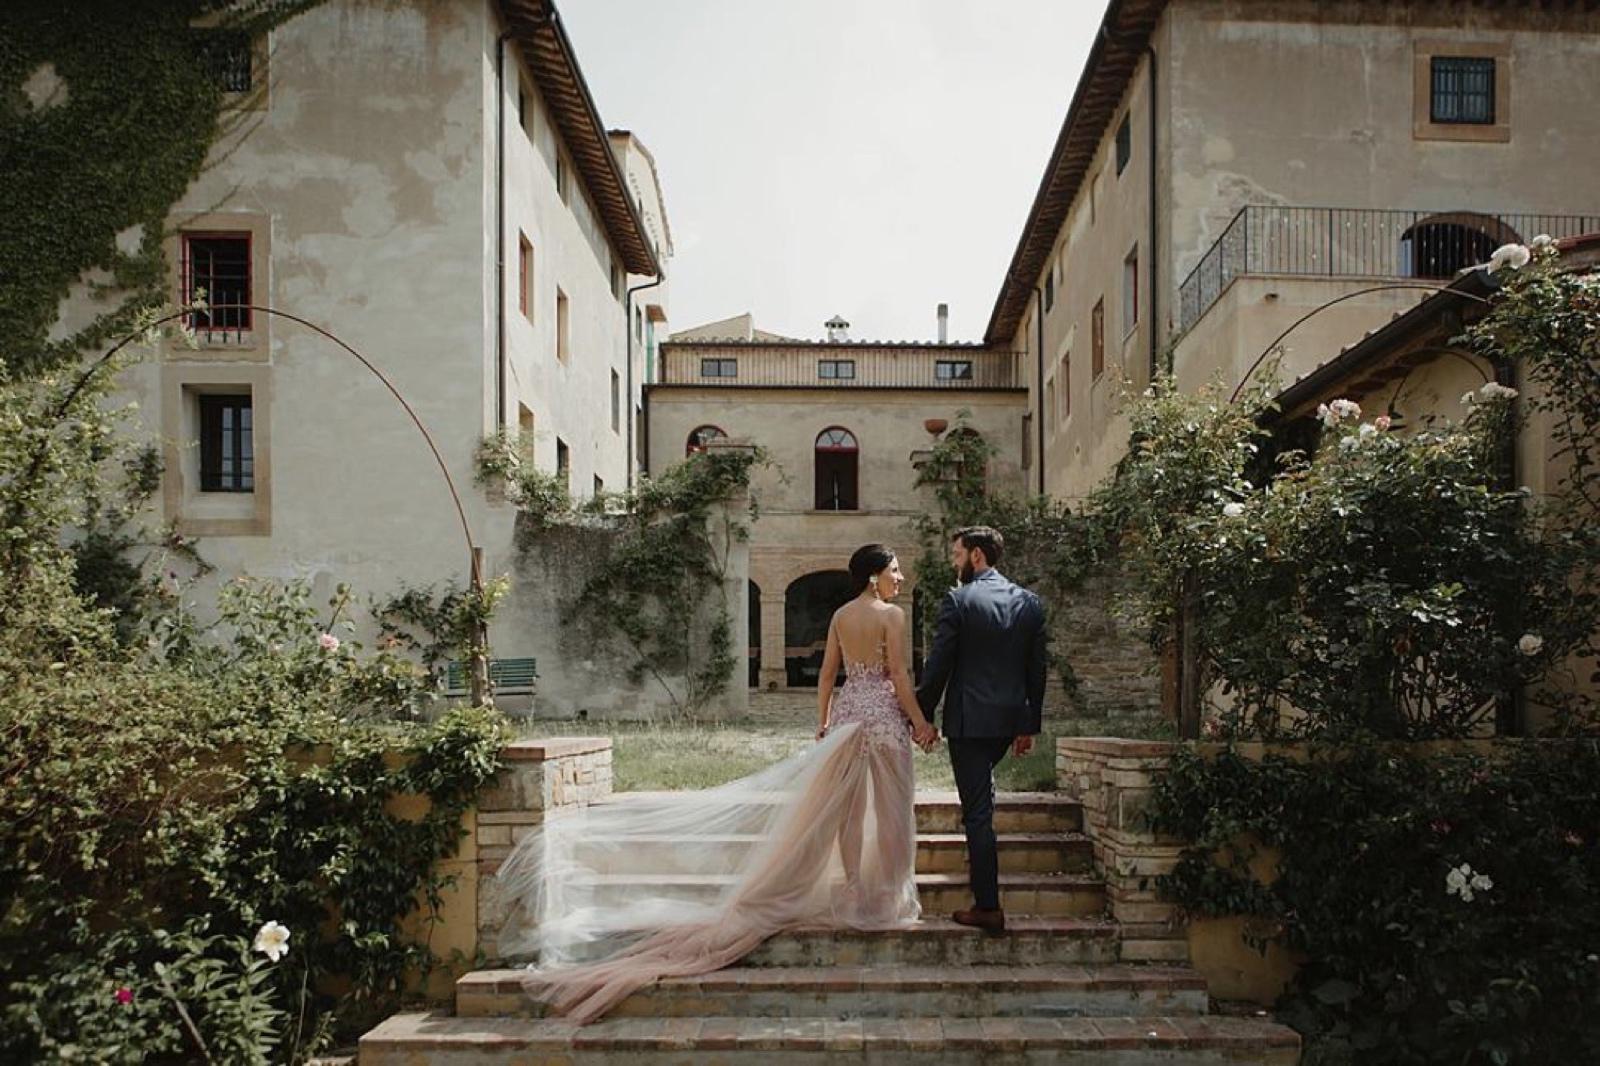 Fotomagoria Best 0f 2018 Wedding Photographer Italy42.jpg